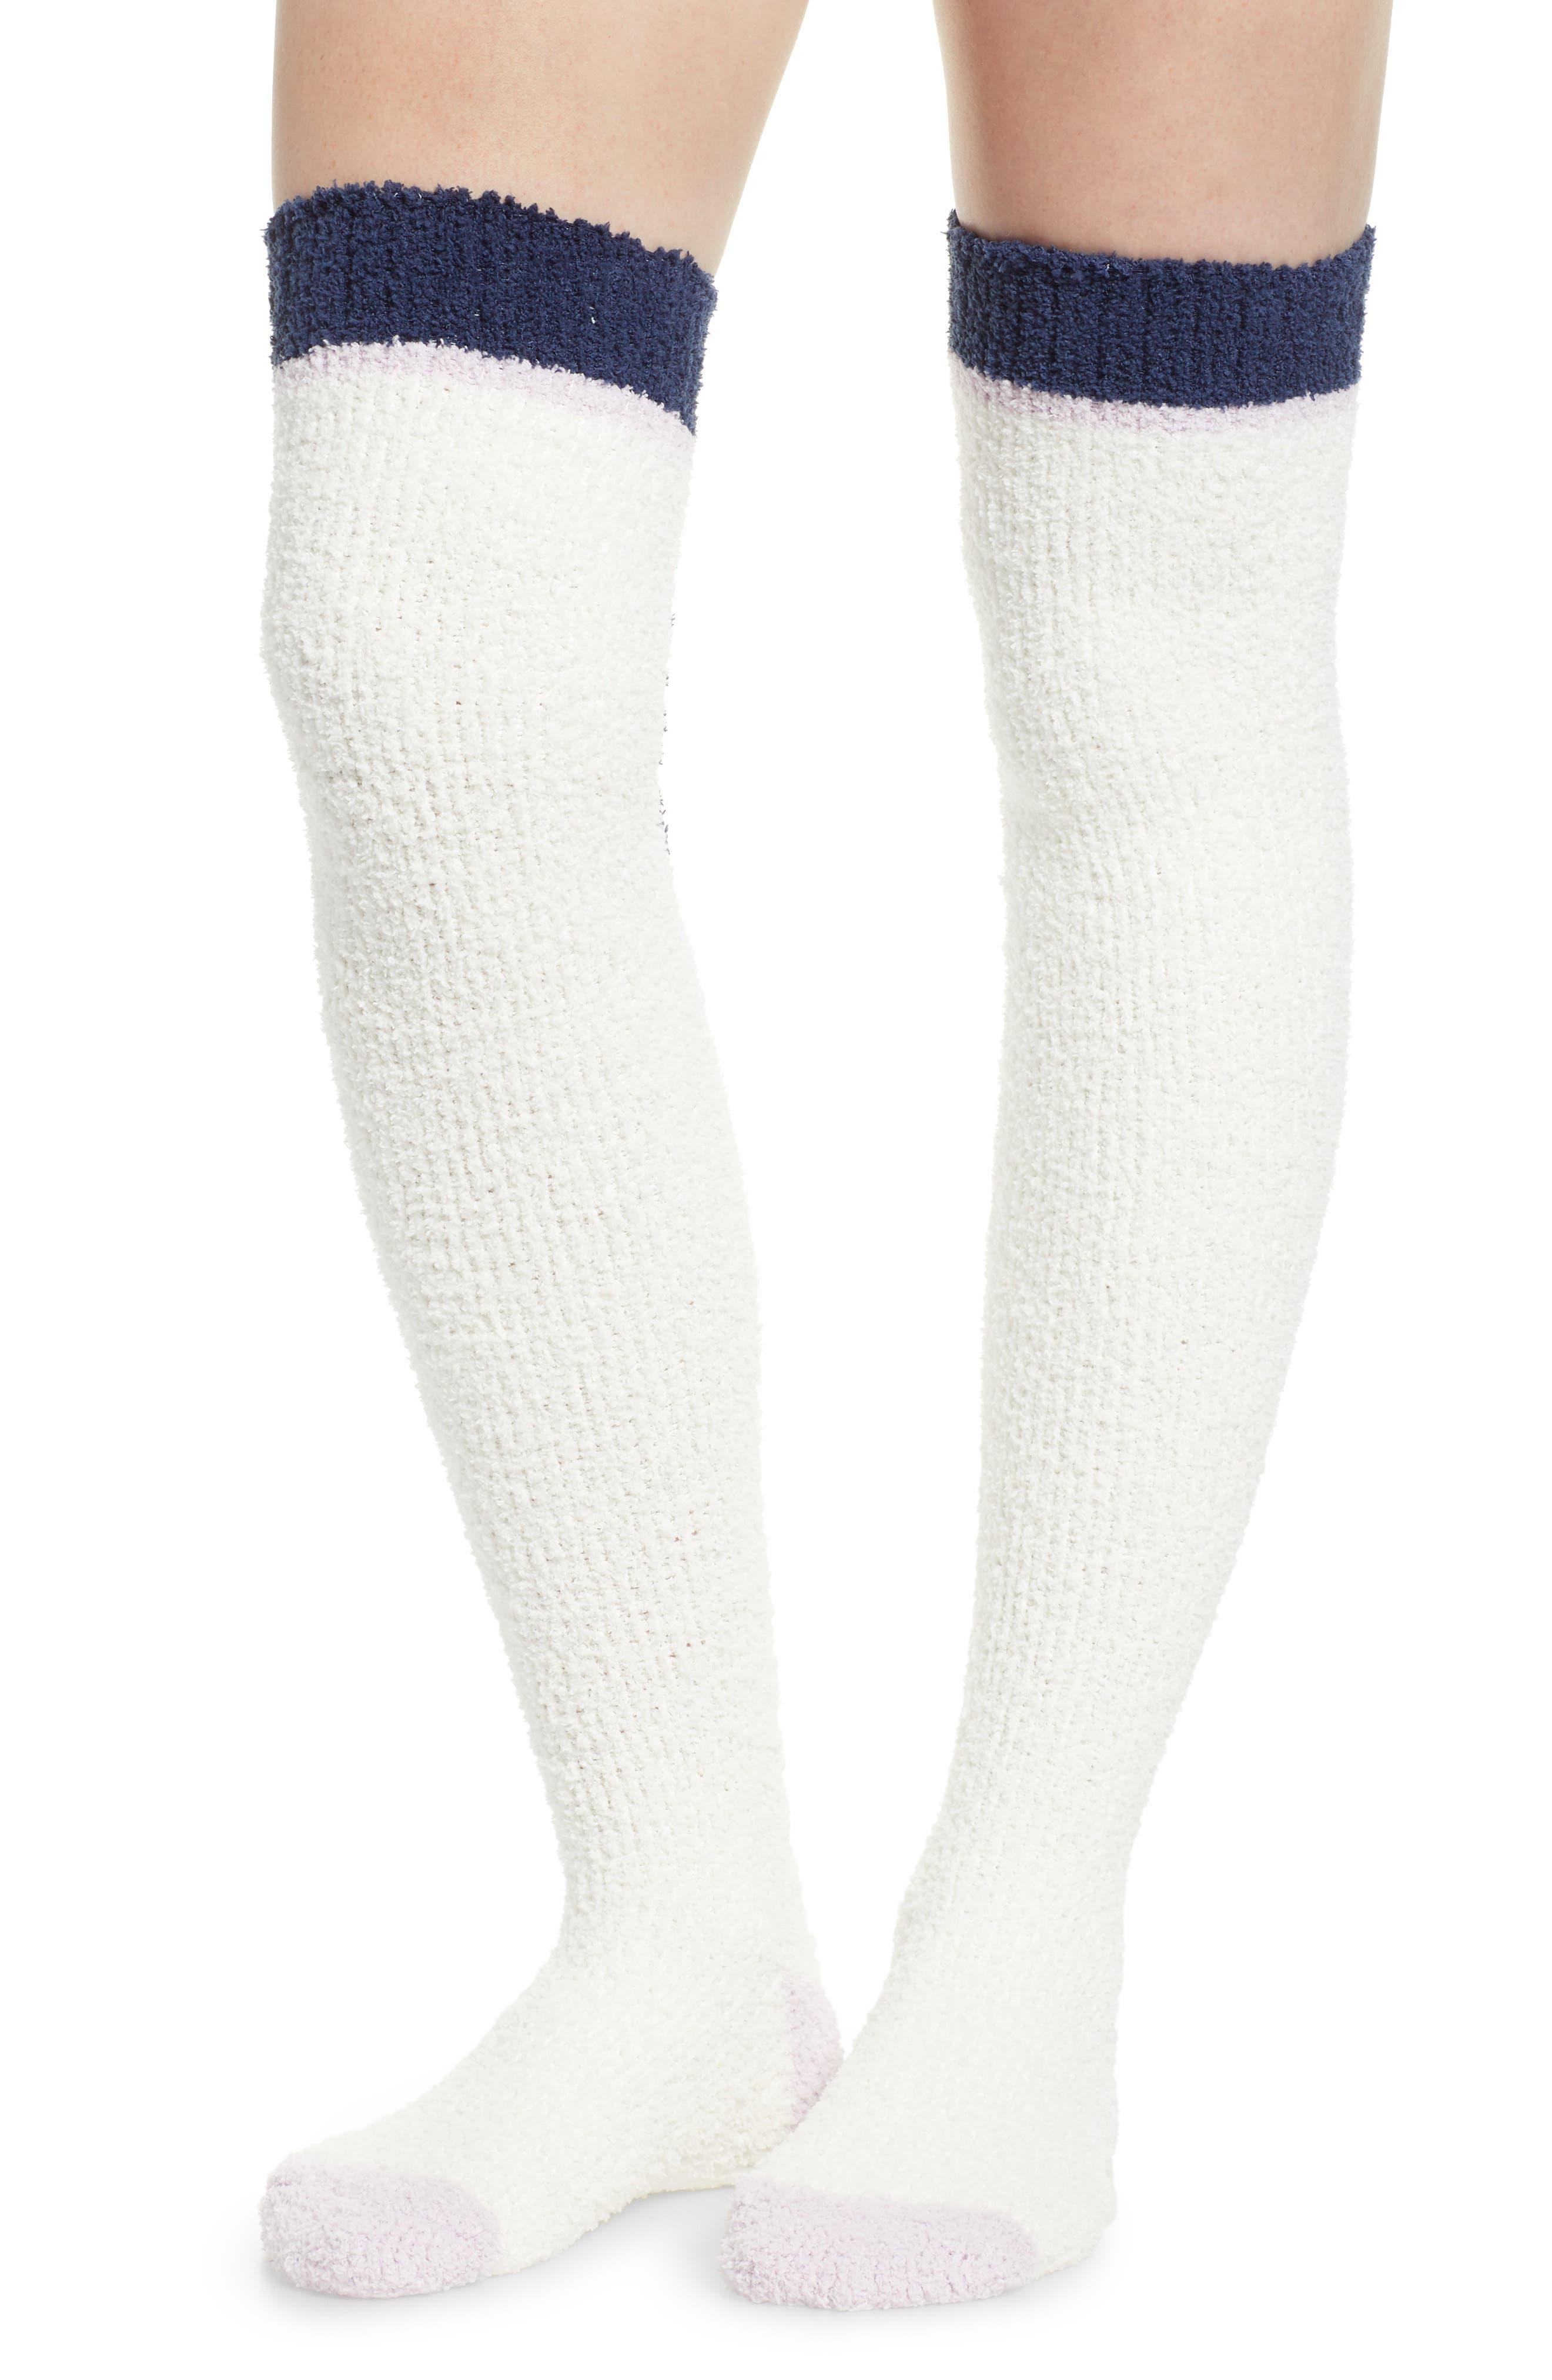 Cozy Over the Knee Socks,                             Main thumbnail 1, color,                             WHITE